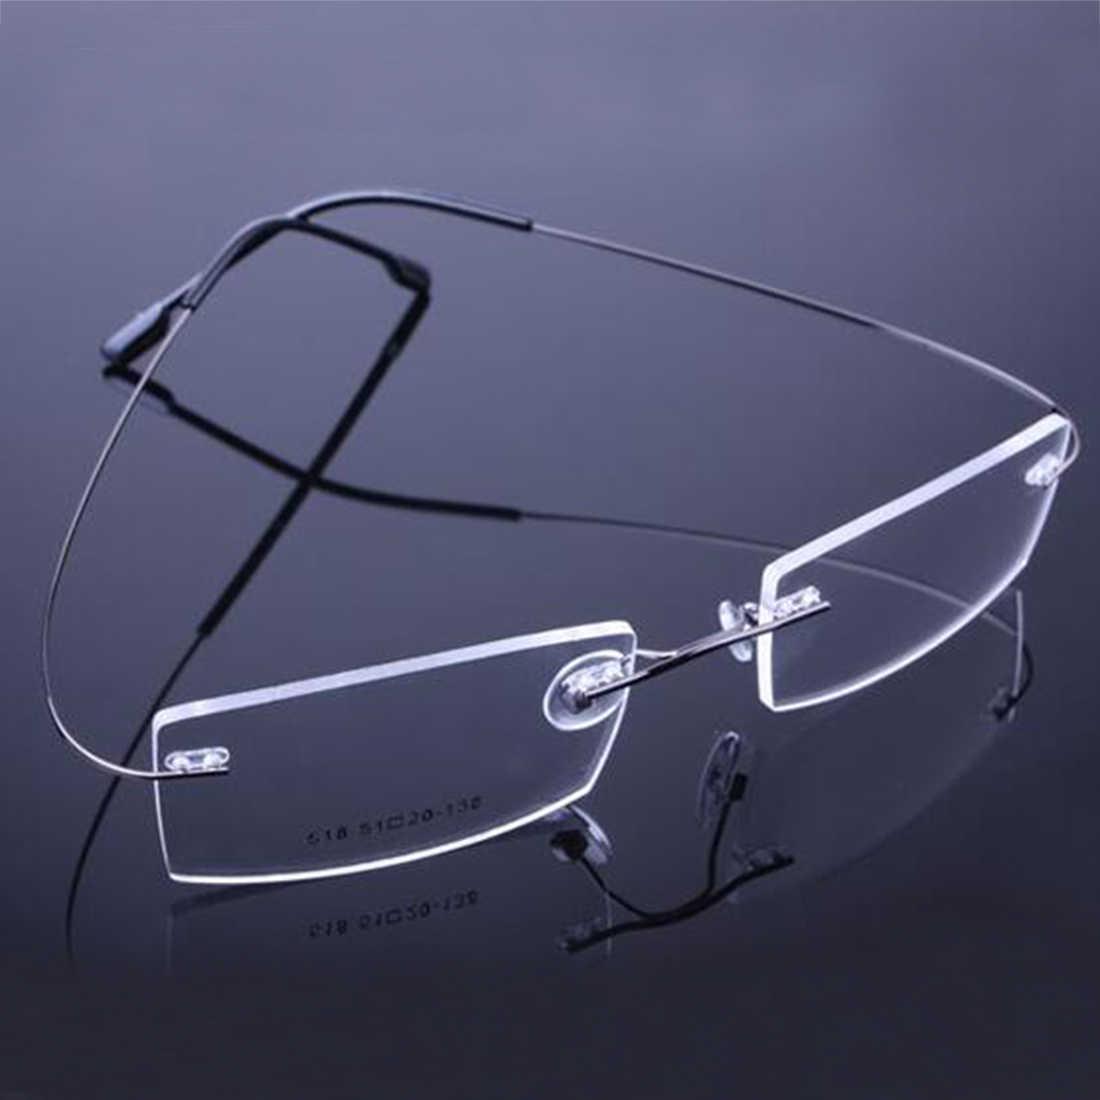 293d4d2b4b ... Fahion Retail 9 Colors Lightweight Rimless Glasses Frames Memory  Titanium Eyeglasses Spectacle Prescription Optical Frames 2018